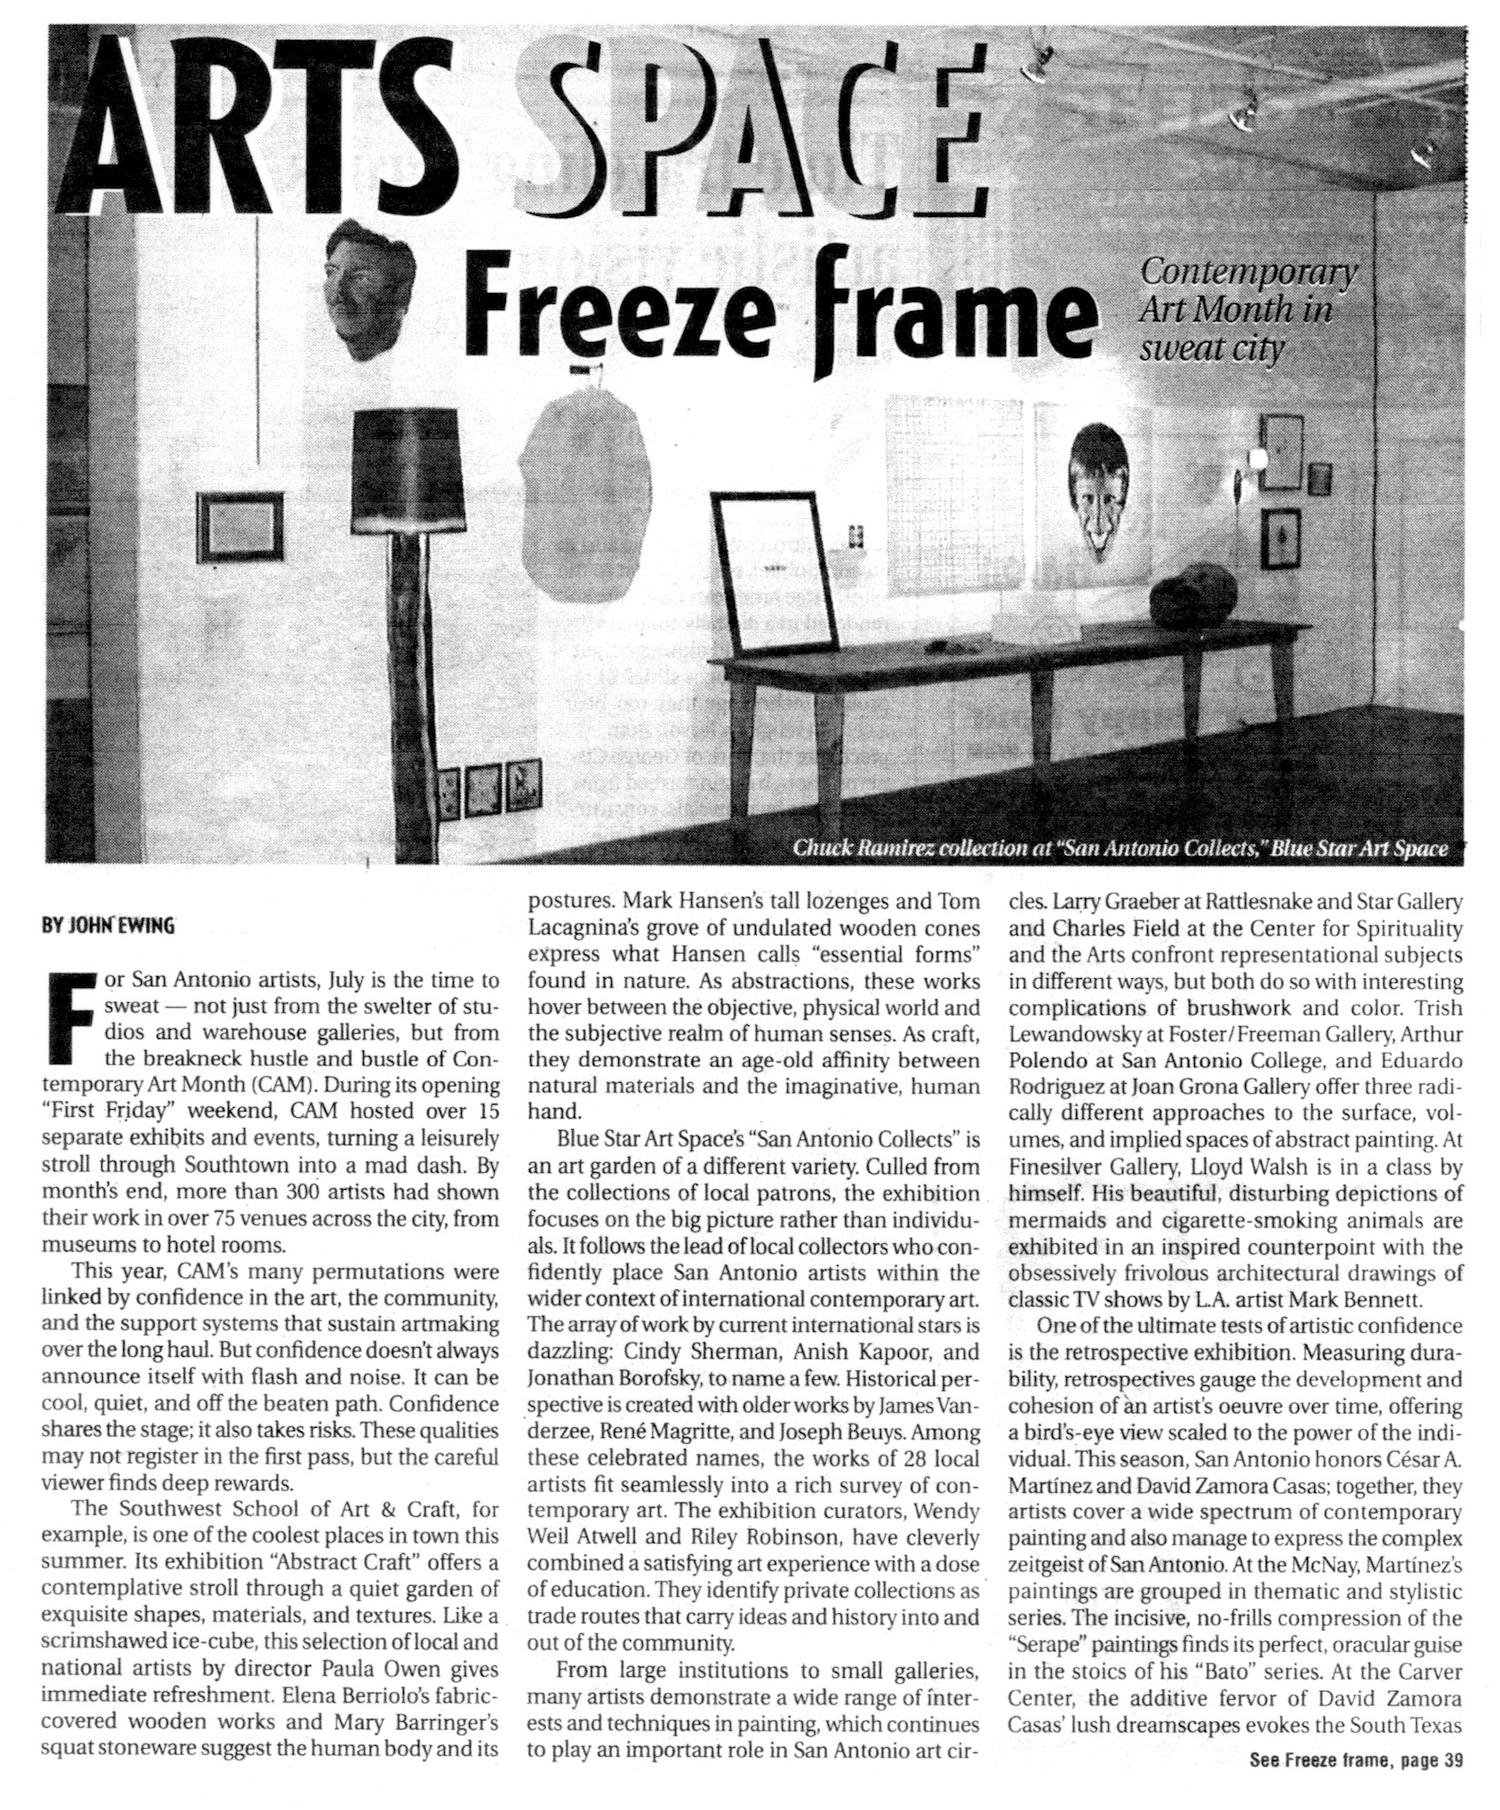 SC_1999_Aug. 5-11_Contemporary Art Month